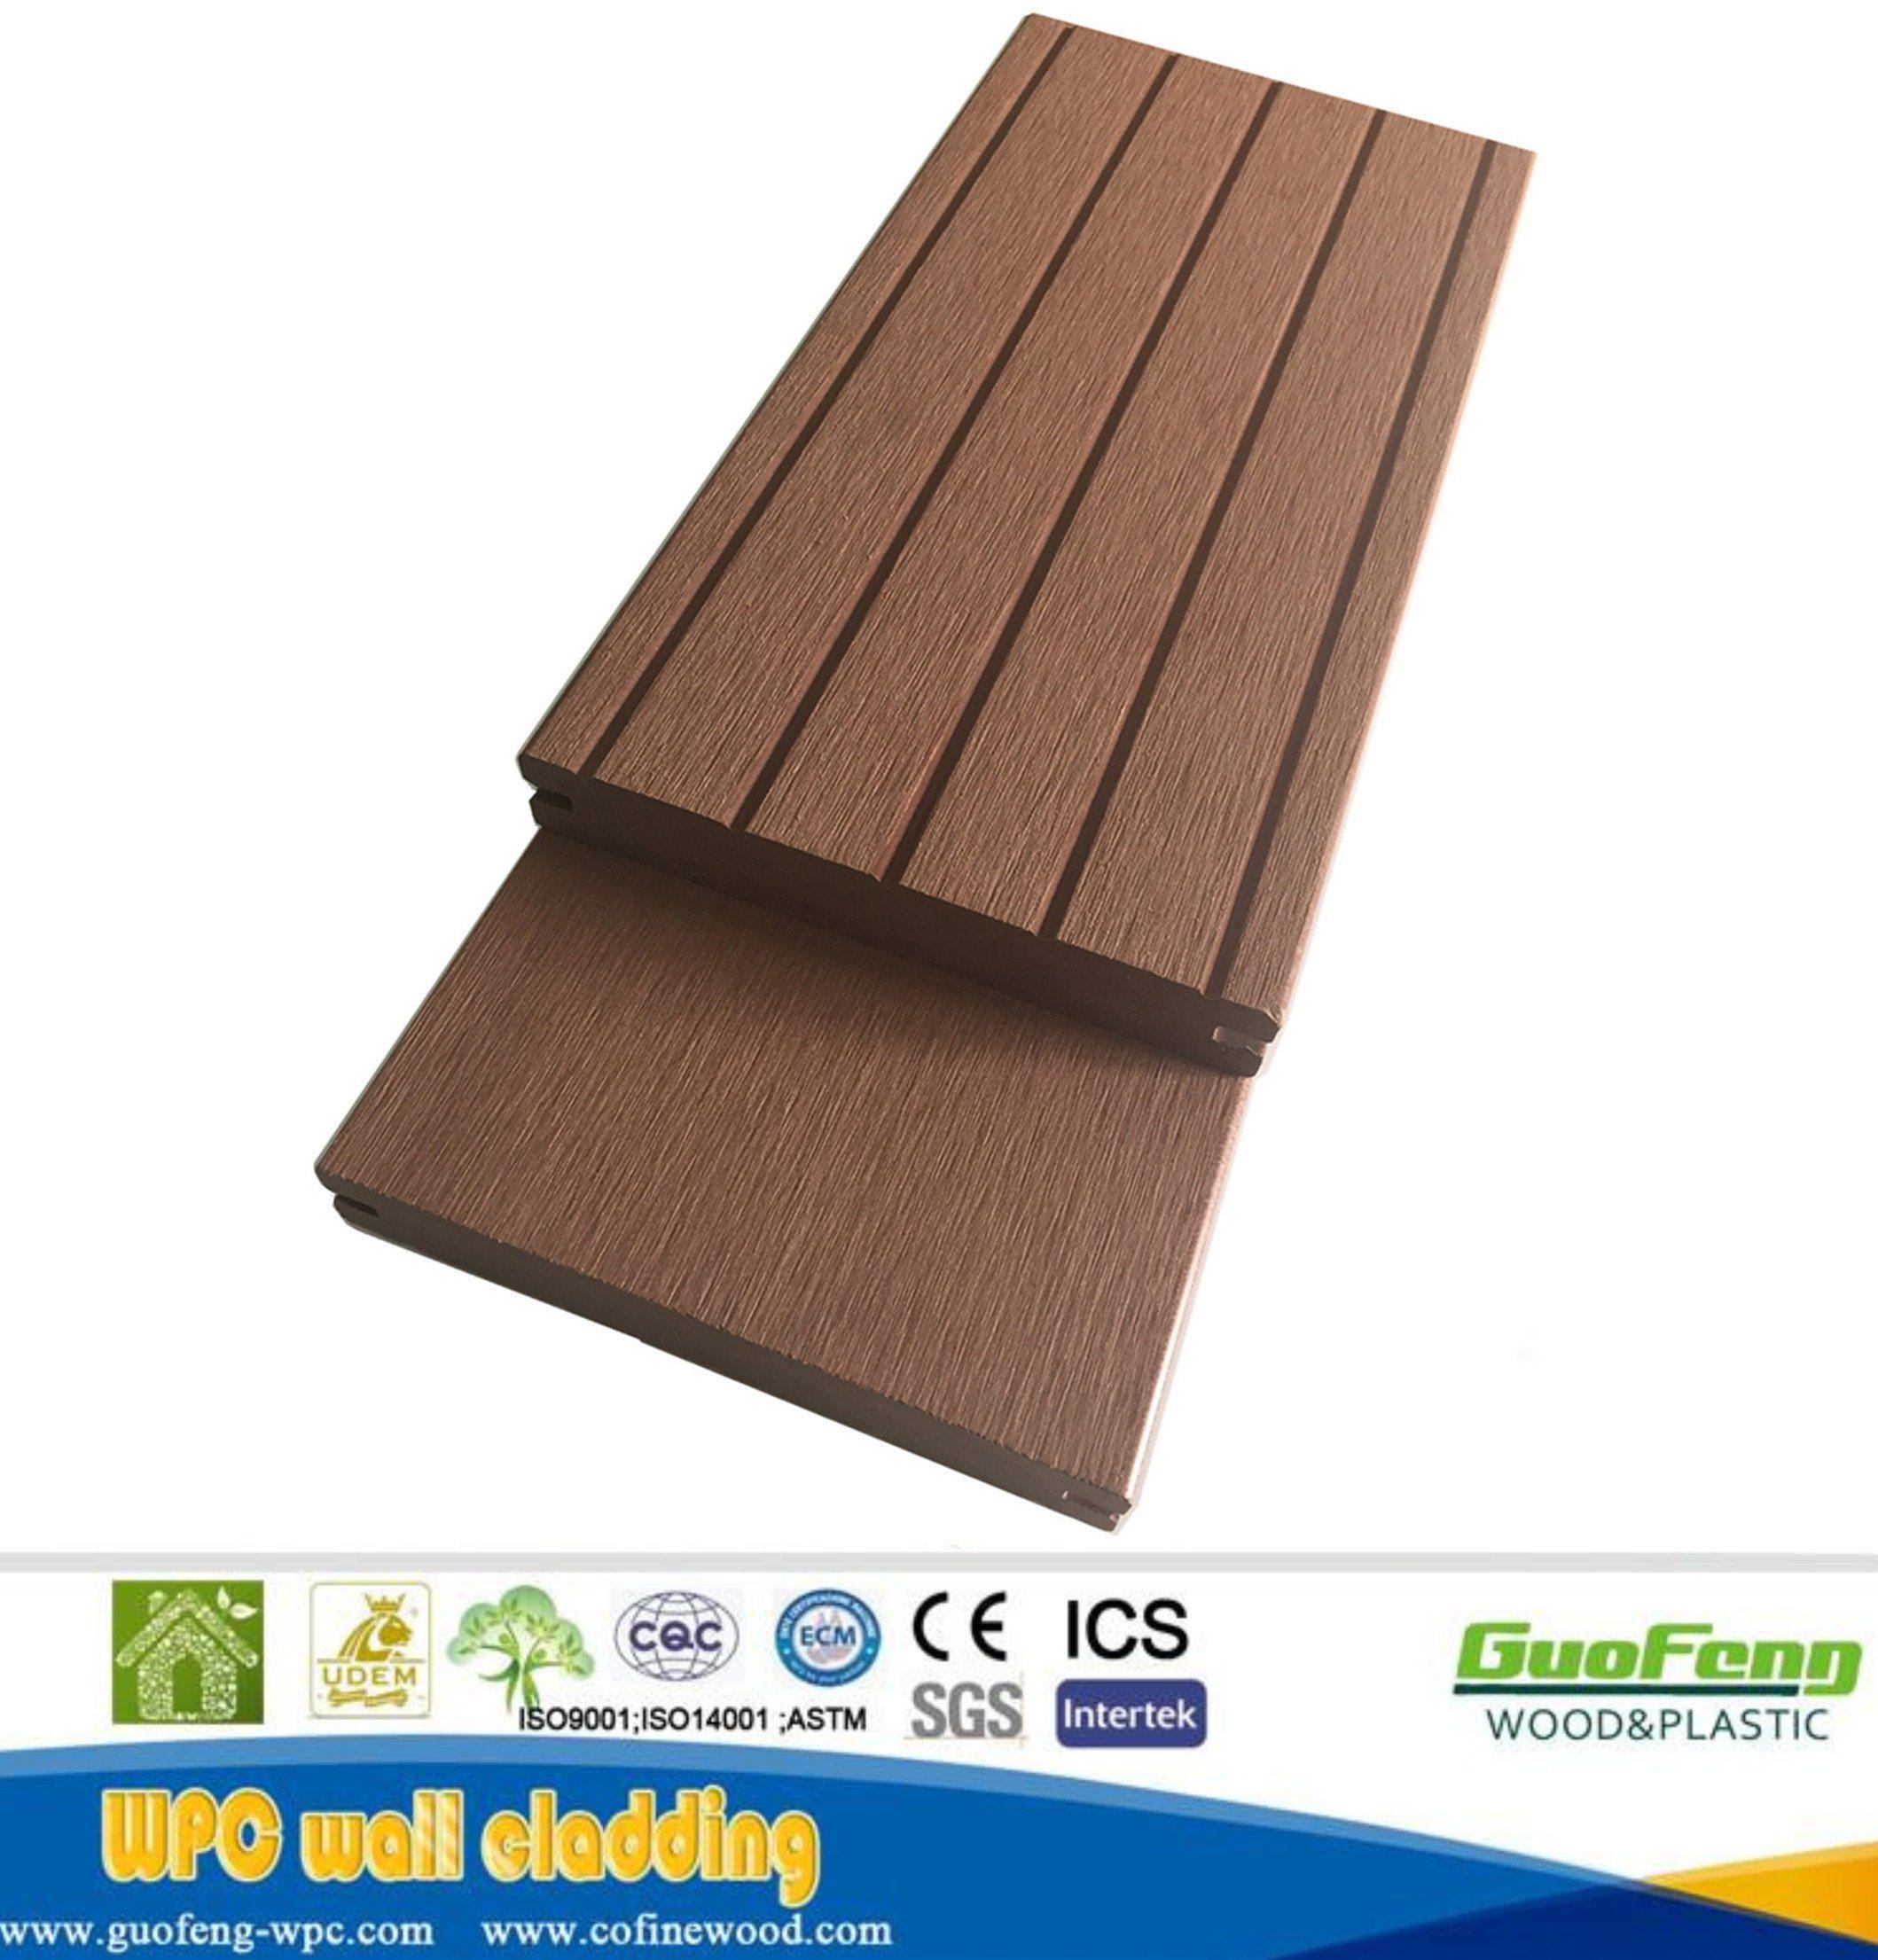 sandiego lifedeck flooring waterproof com decking contractor san residential diego epoxy deck floor staining concrete